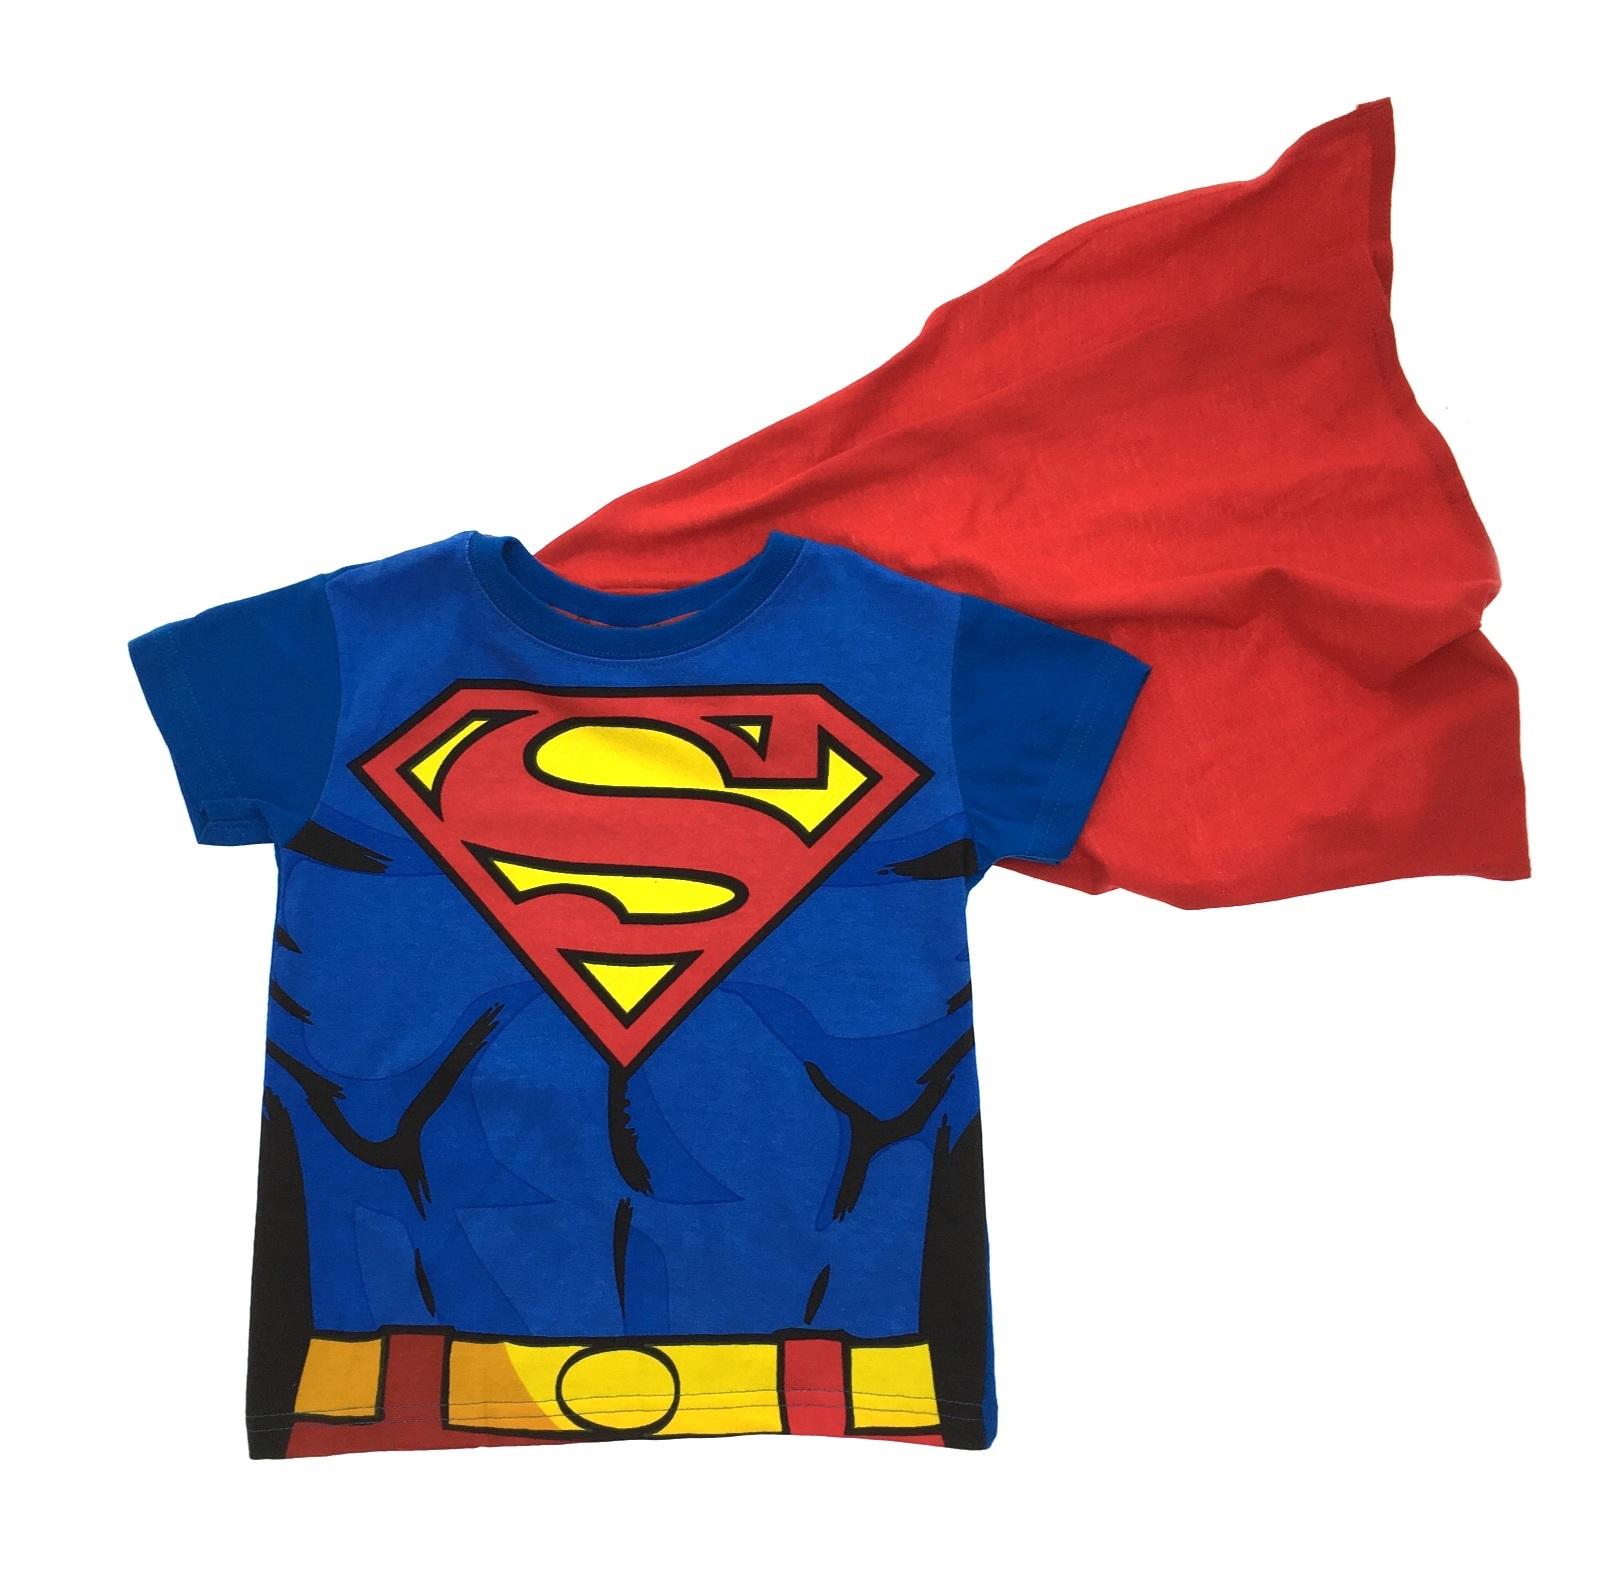 boys t shirt with cape character dress up short sleeve top kids fancy dress size ebay. Black Bedroom Furniture Sets. Home Design Ideas